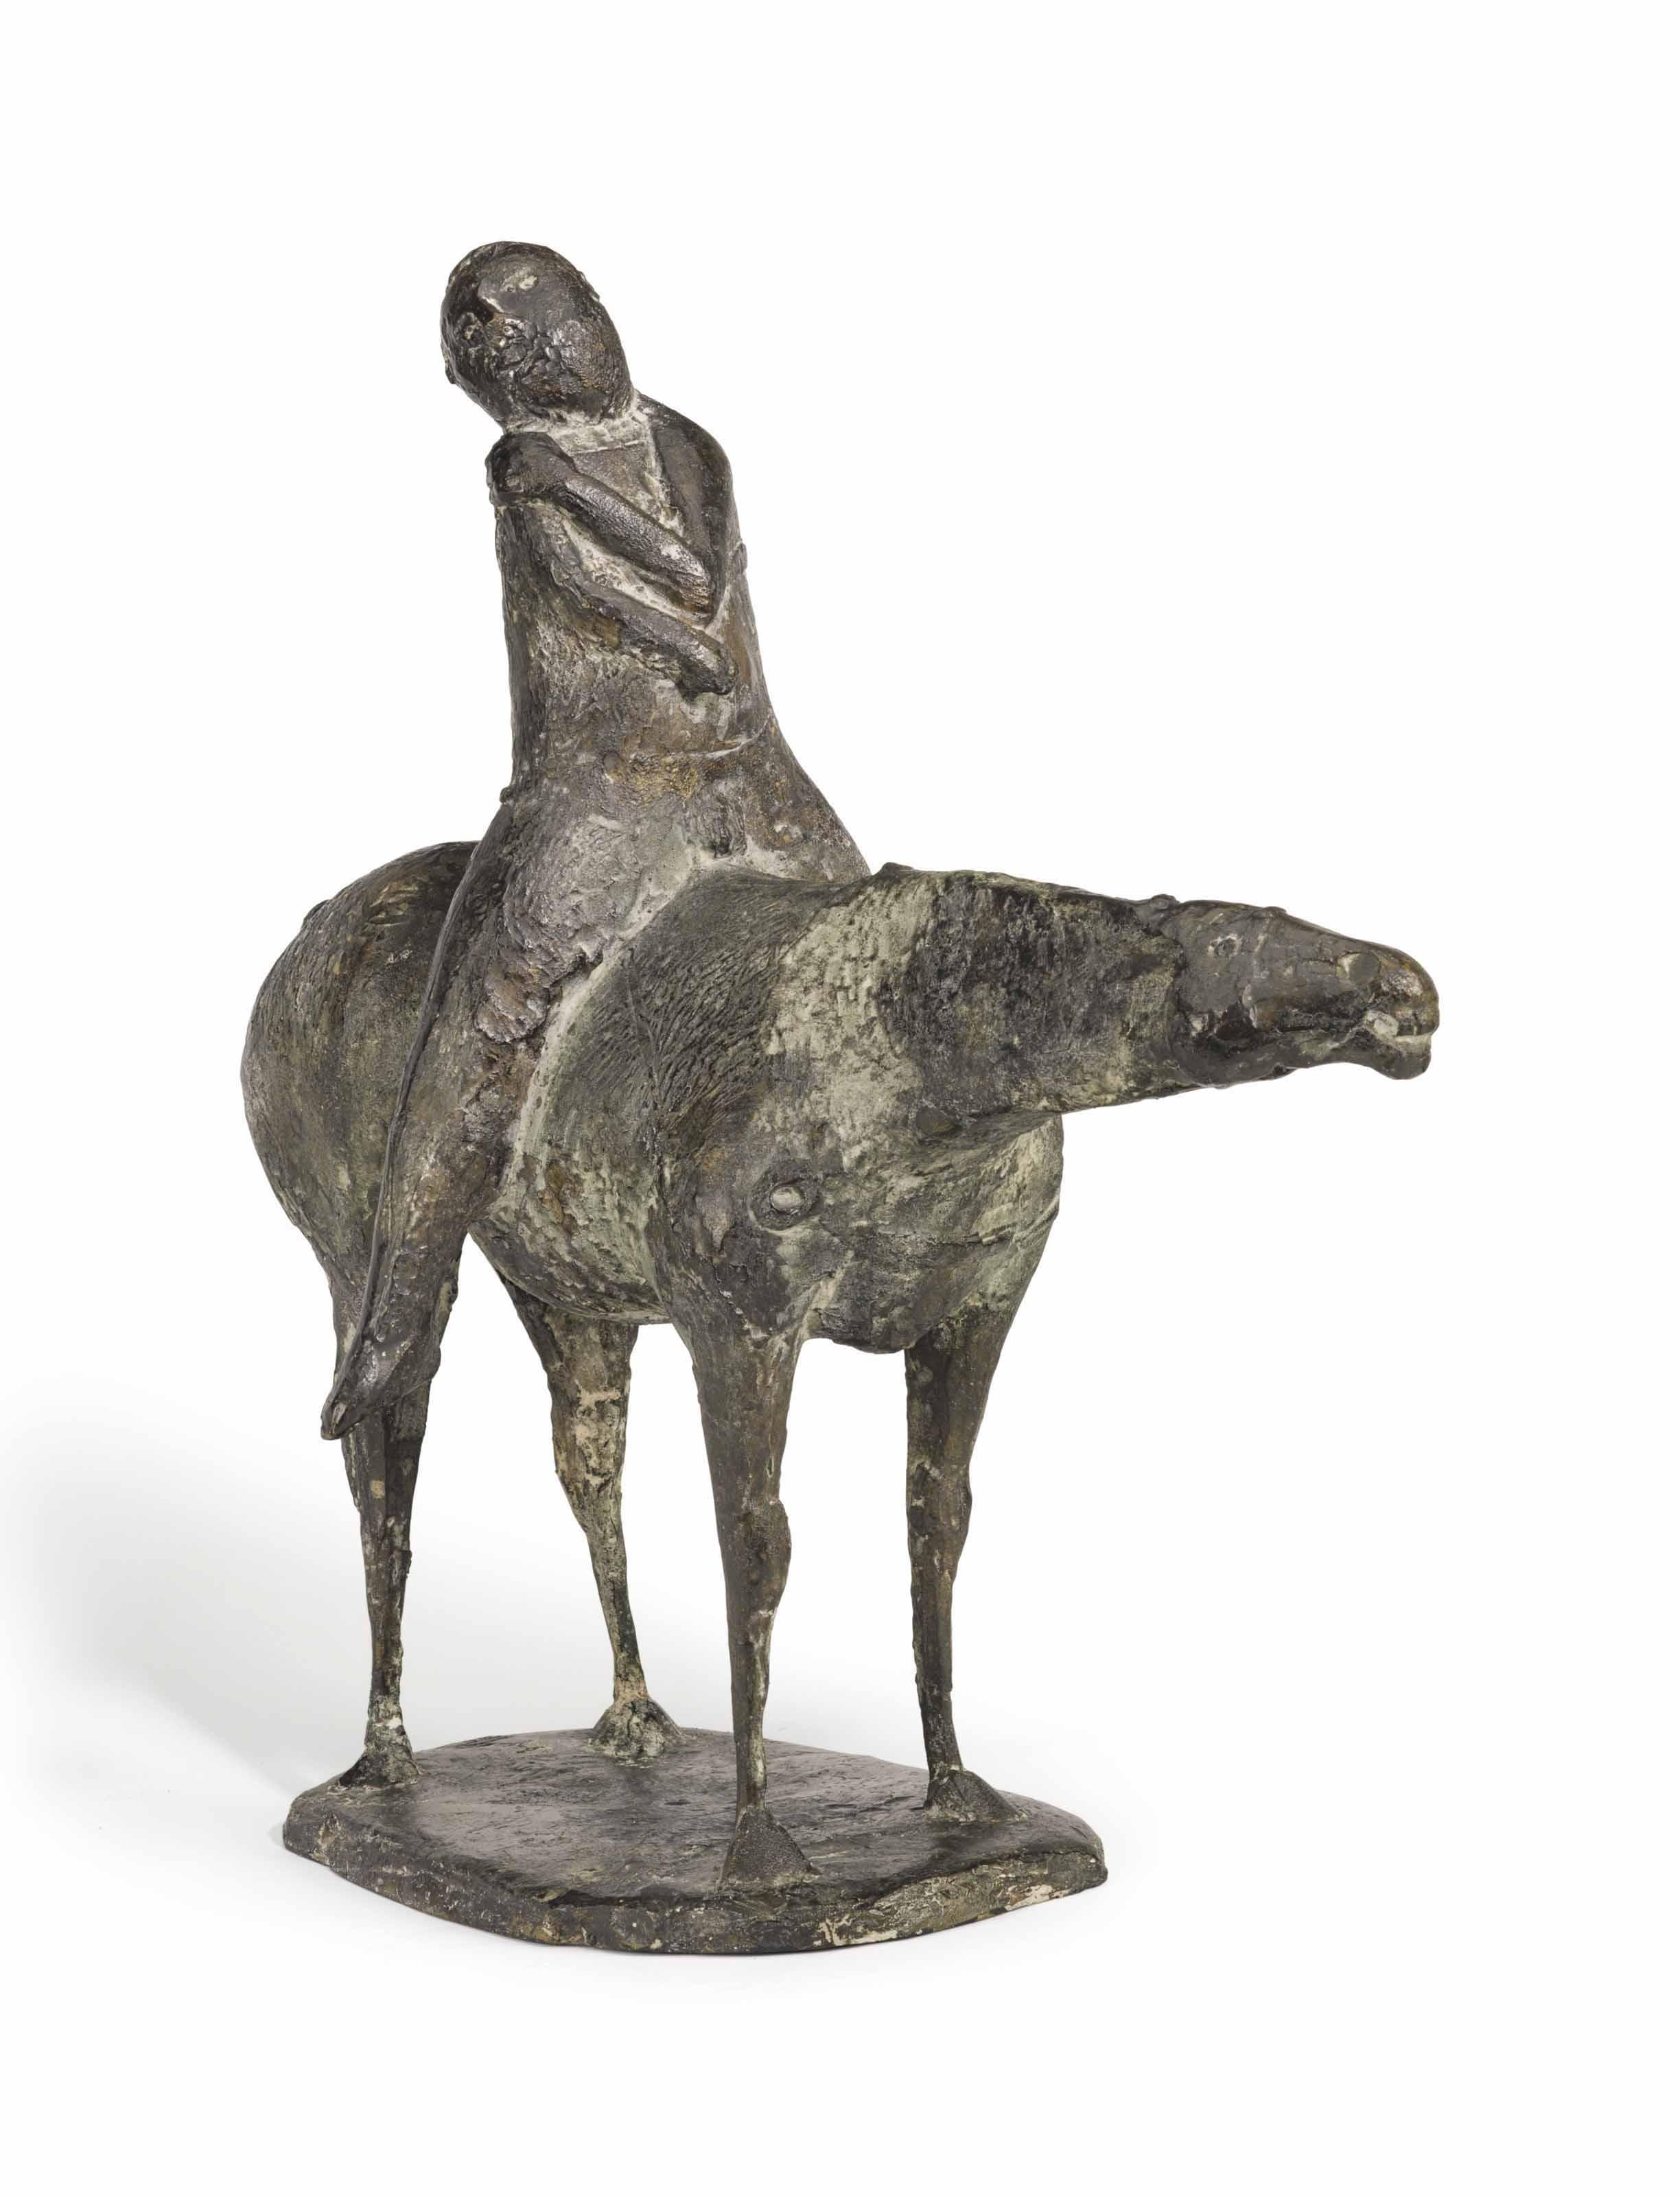 Marino Marini (sculptor)